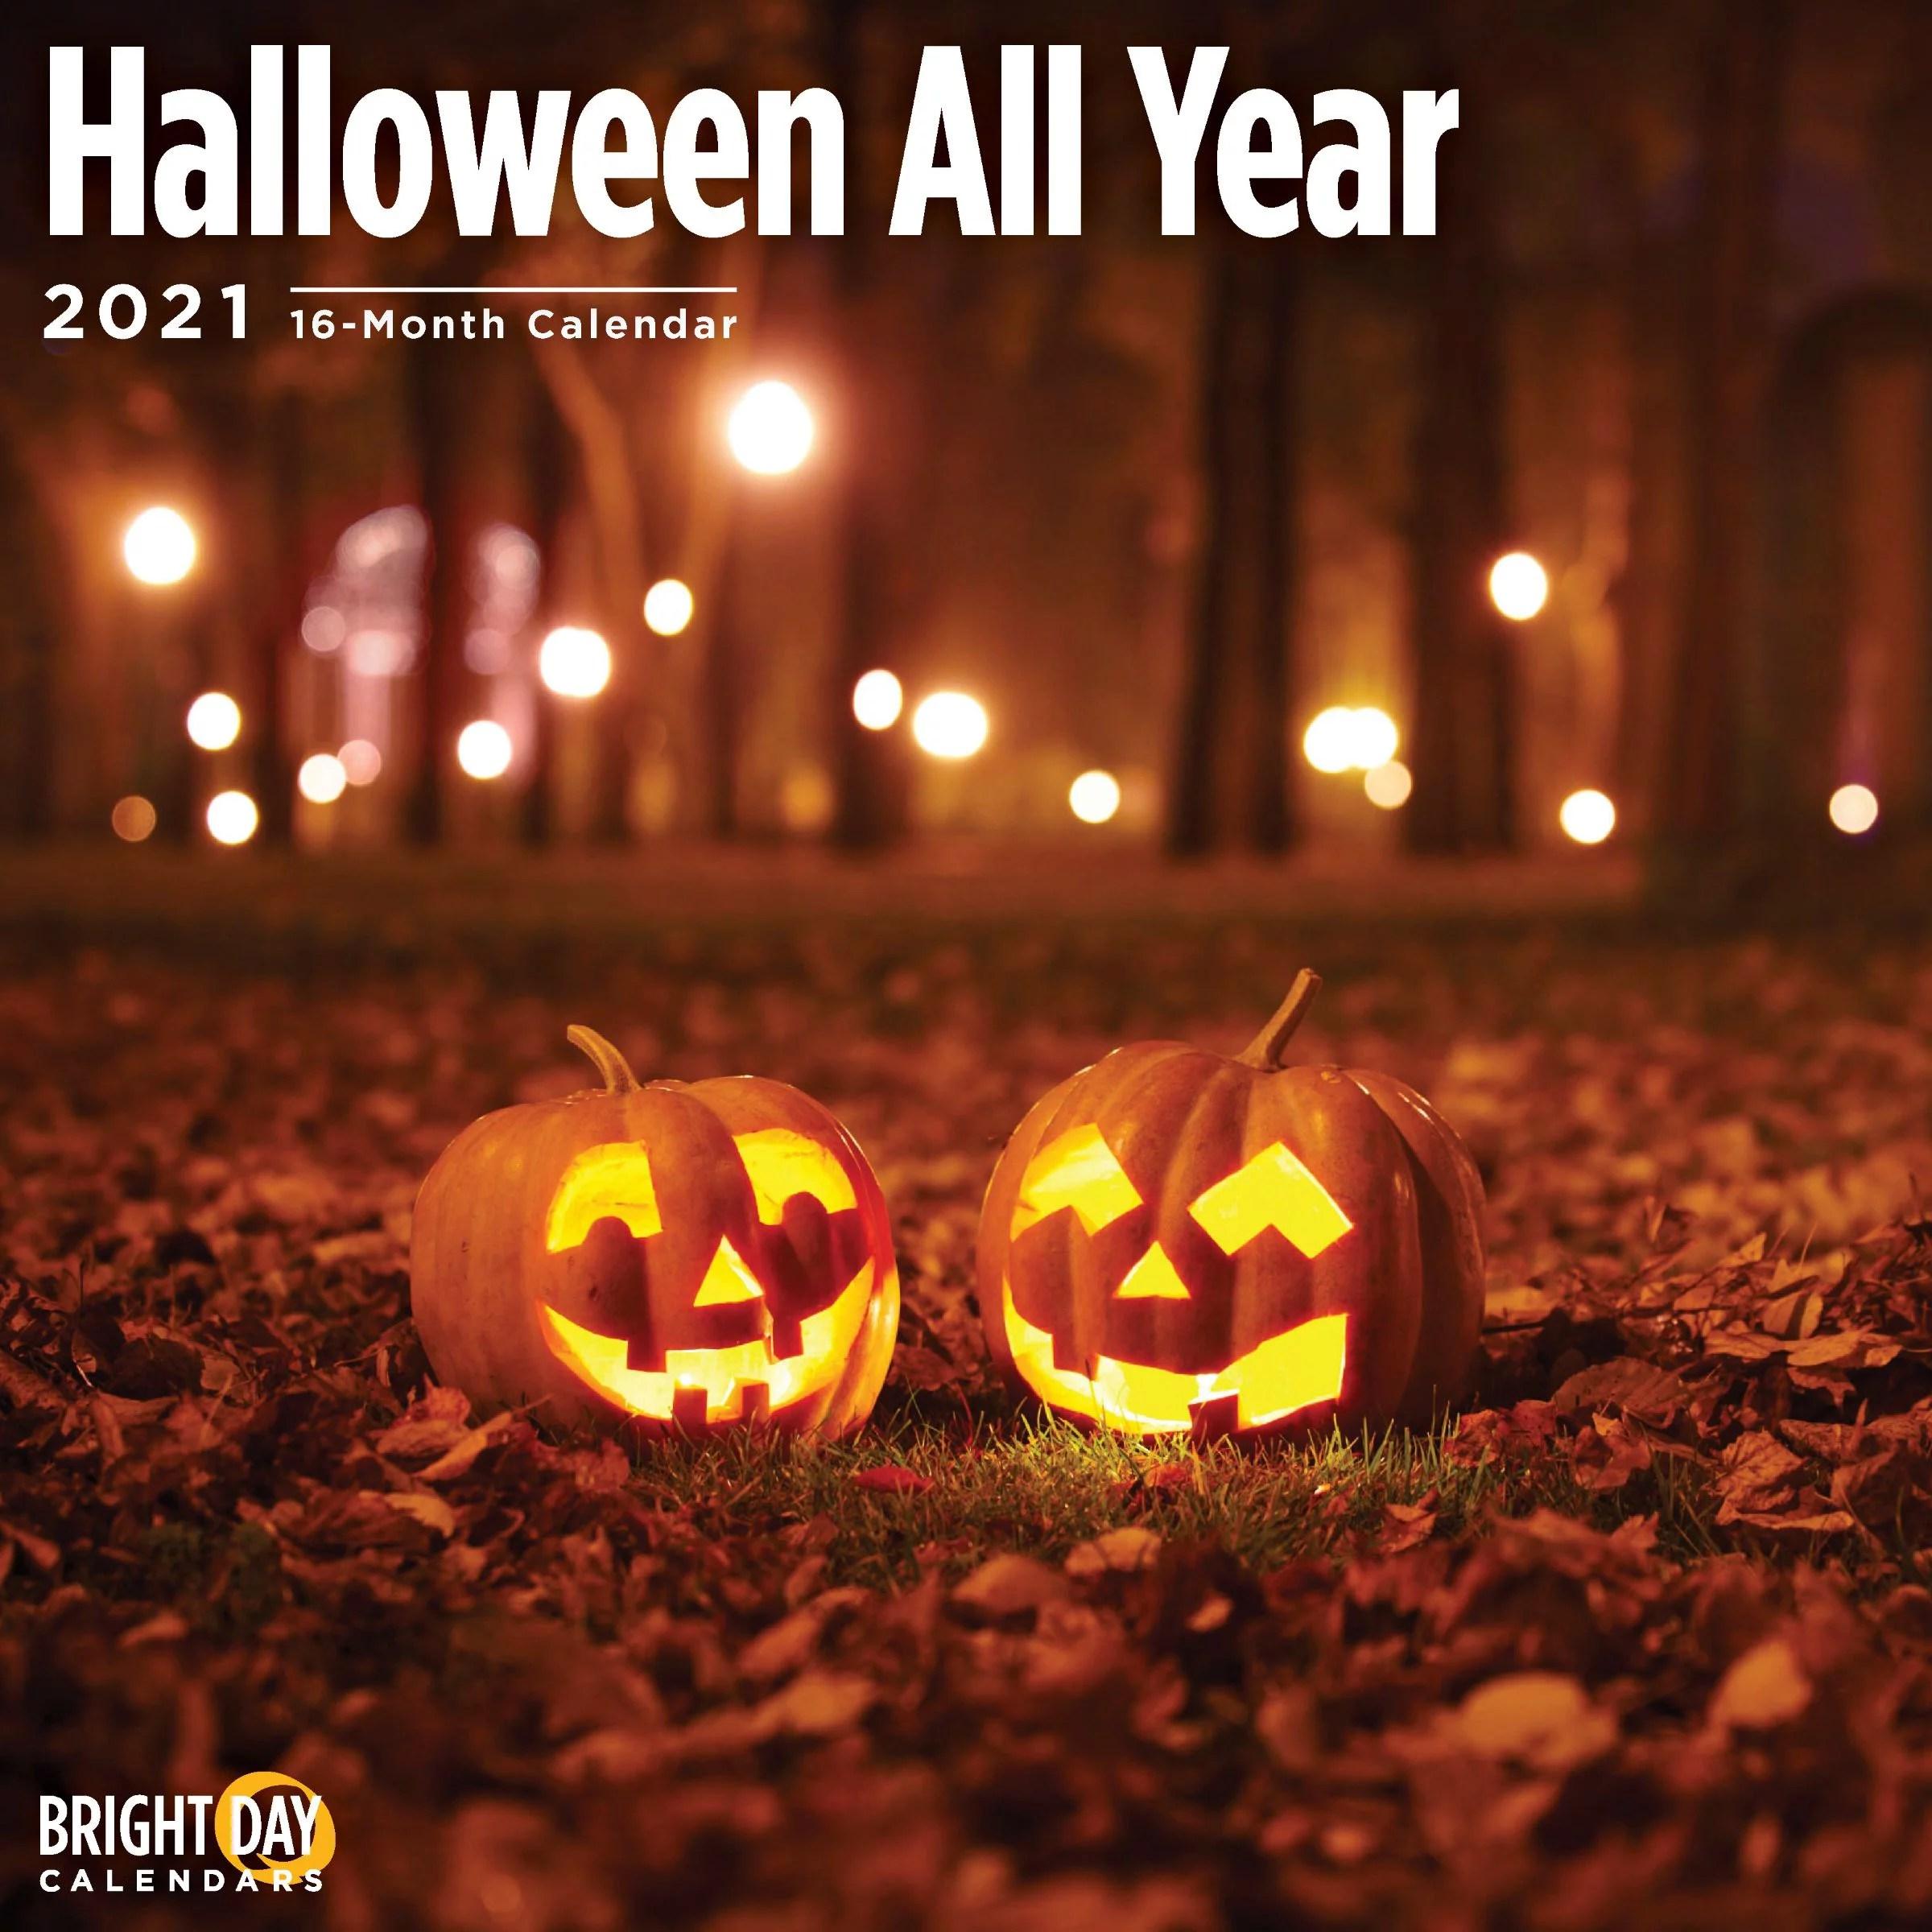 Insane profit halloween 2021 you must prepare growtopia. 2021 Halloween All Year Wall Calendar - Walmart.com - Walmart.com